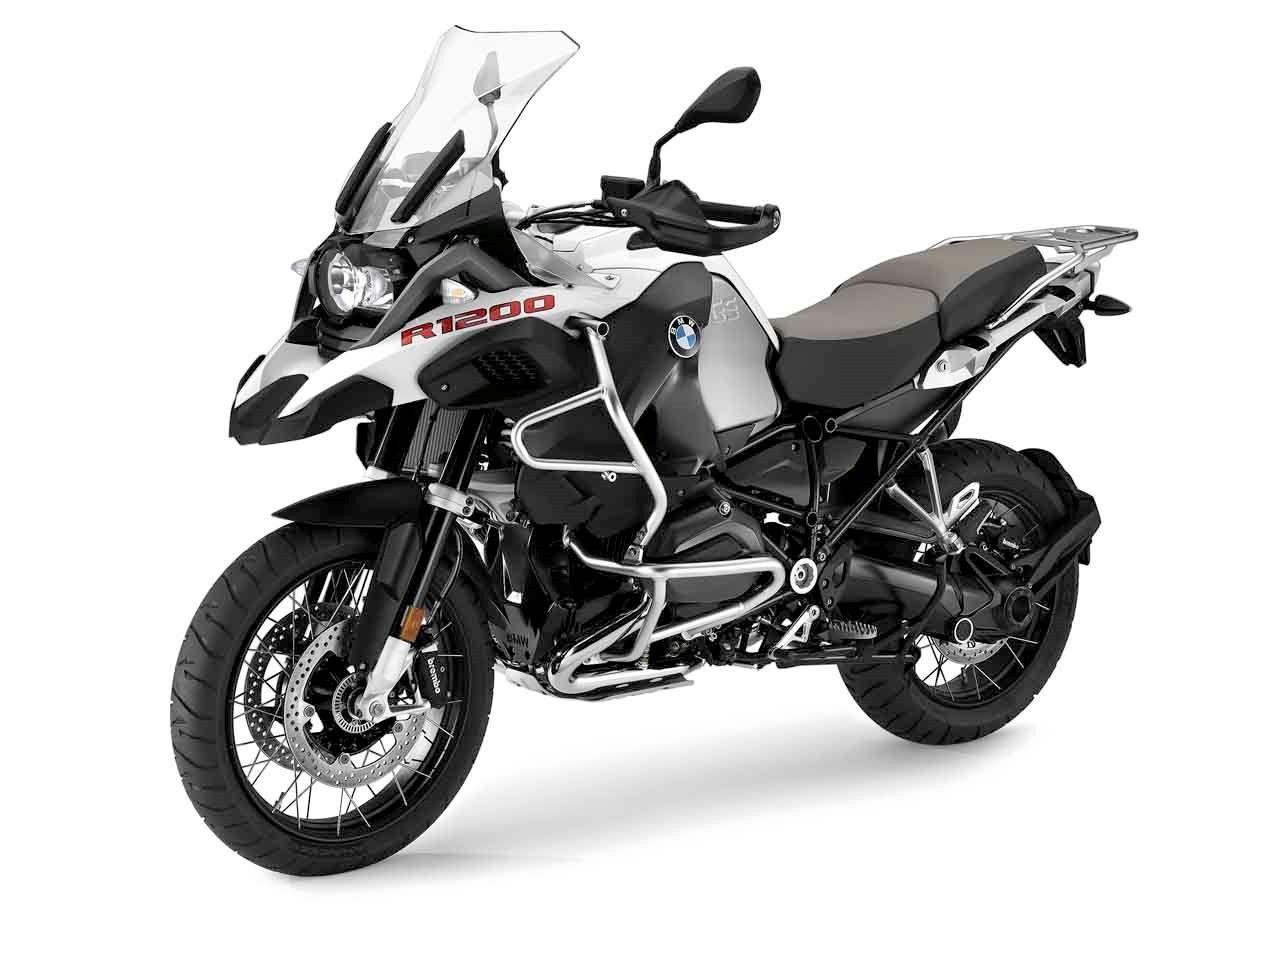 moto neuve acheter bmw r 1200 gs adventure abs arrigoni sport gmbh adliswil. Black Bedroom Furniture Sets. Home Design Ideas